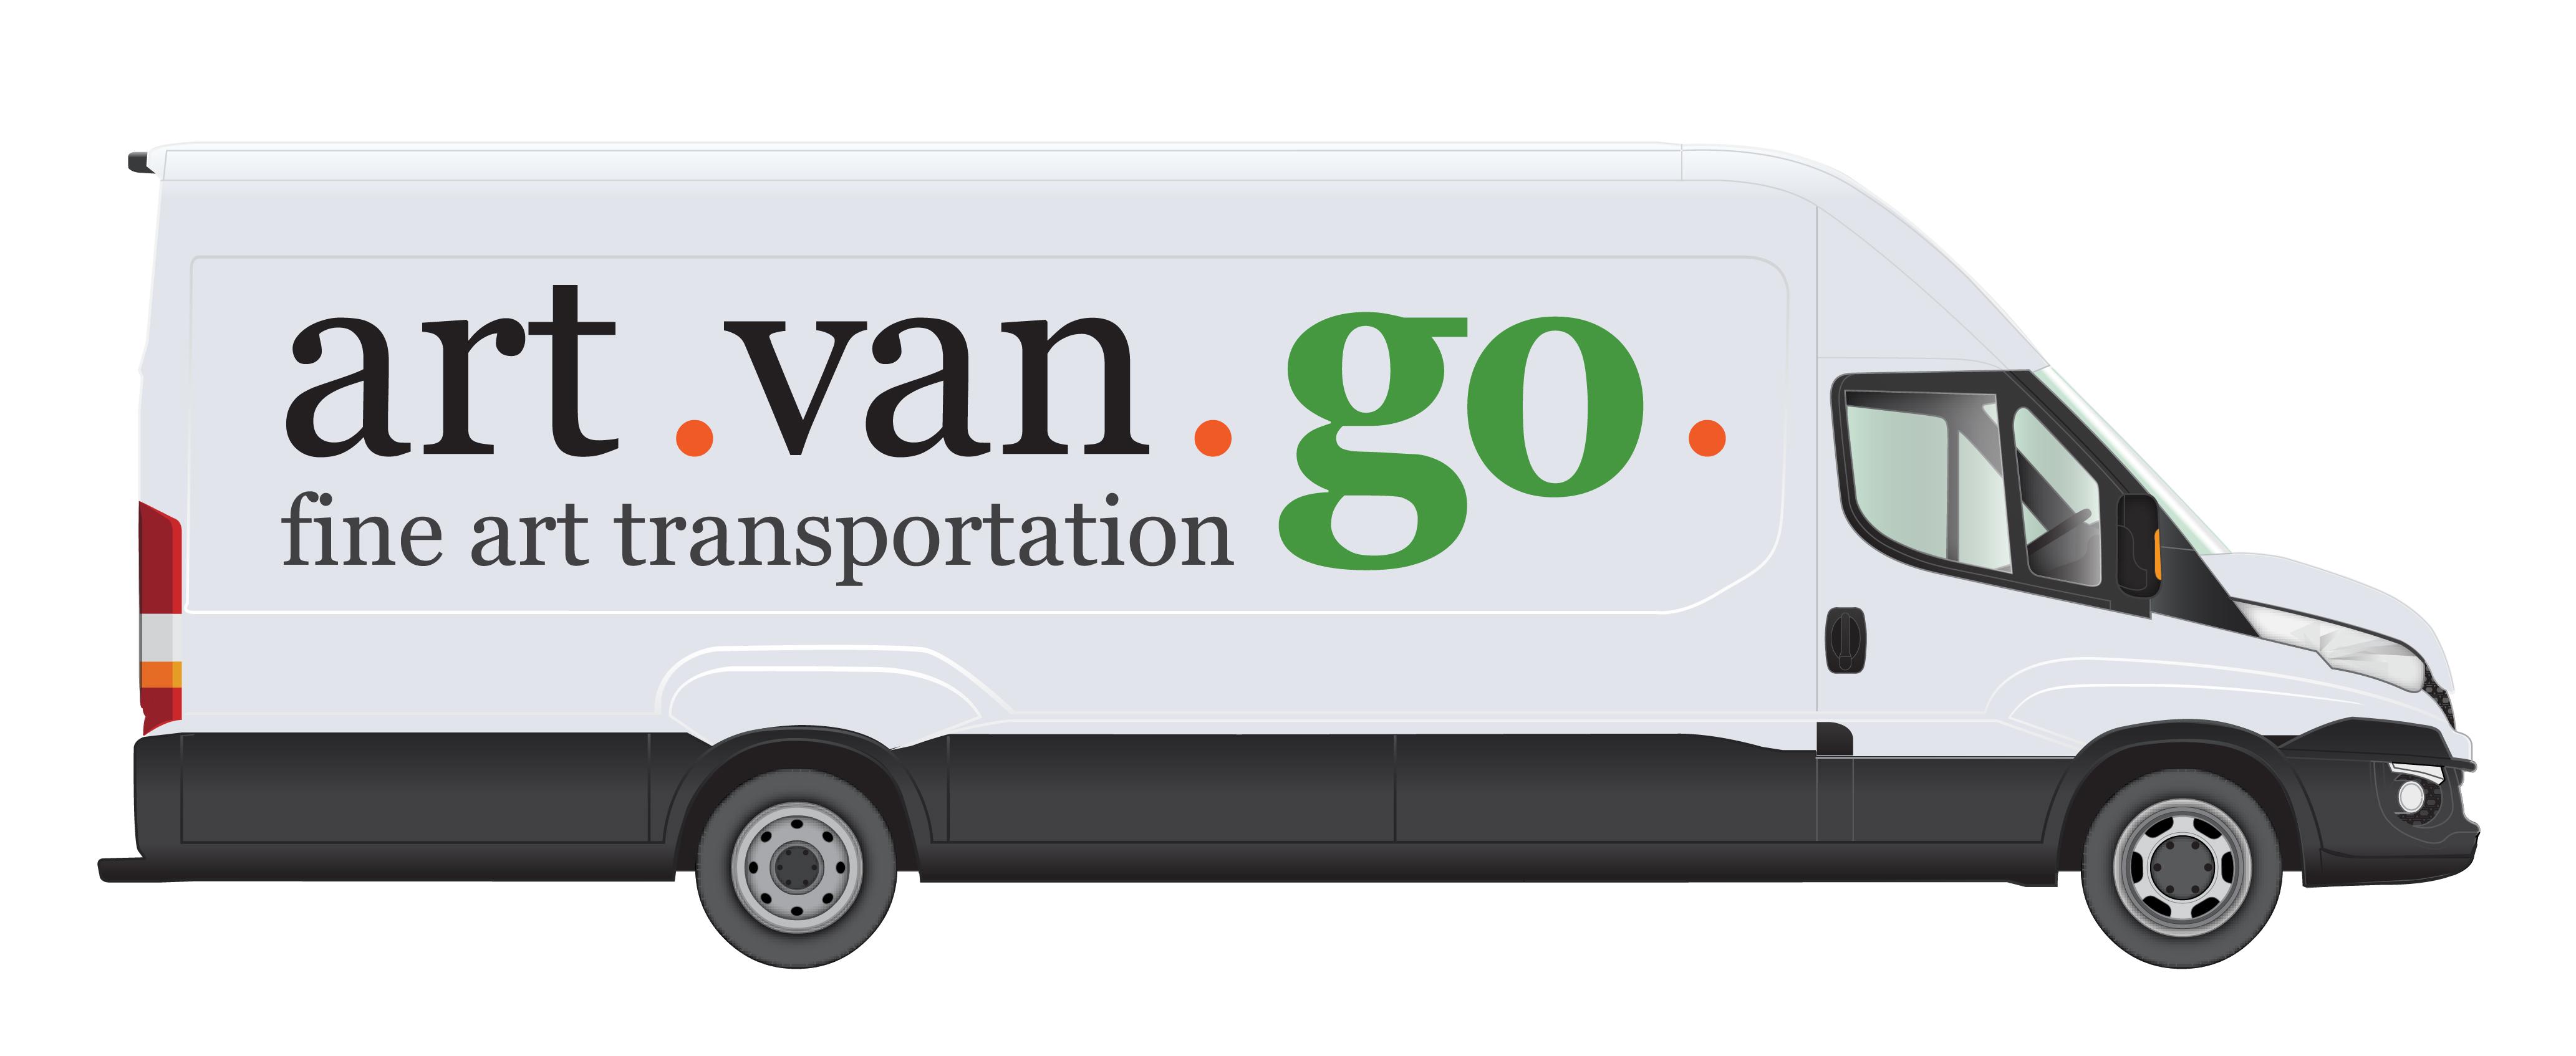 Art Van Go Logo John Fries Award Jpg 4131x1694